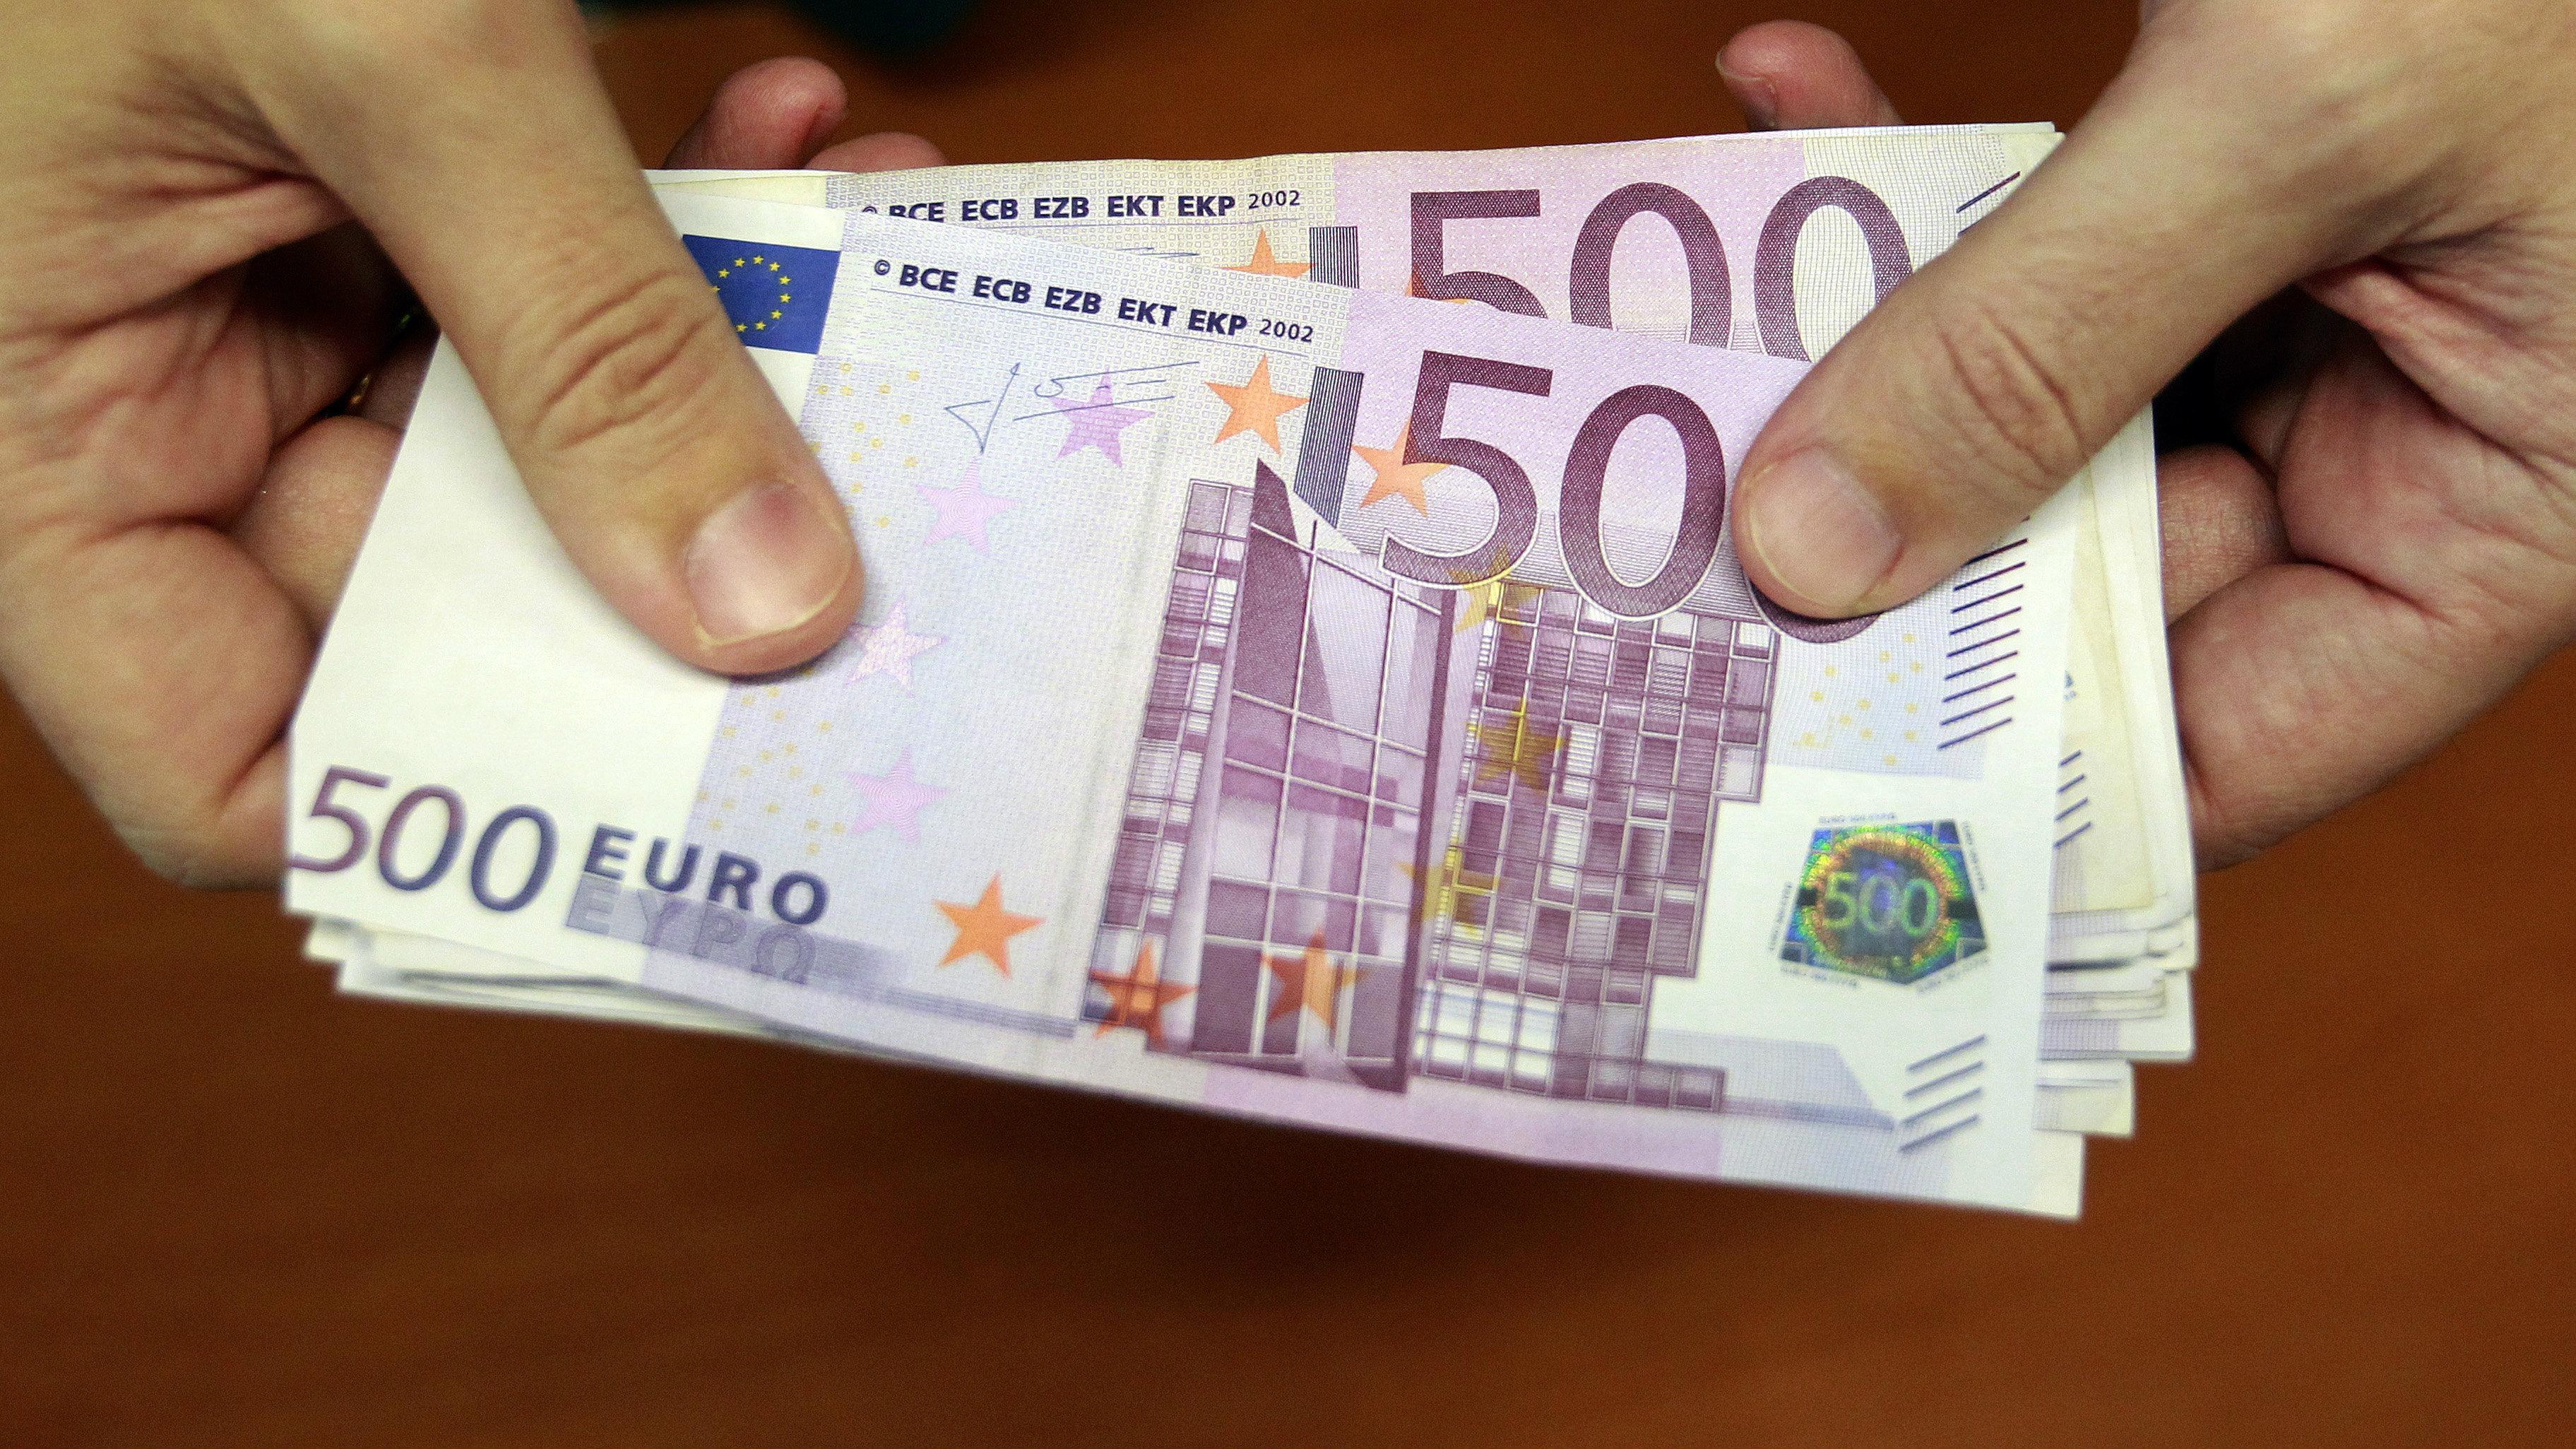 John Hatte 500 Euro